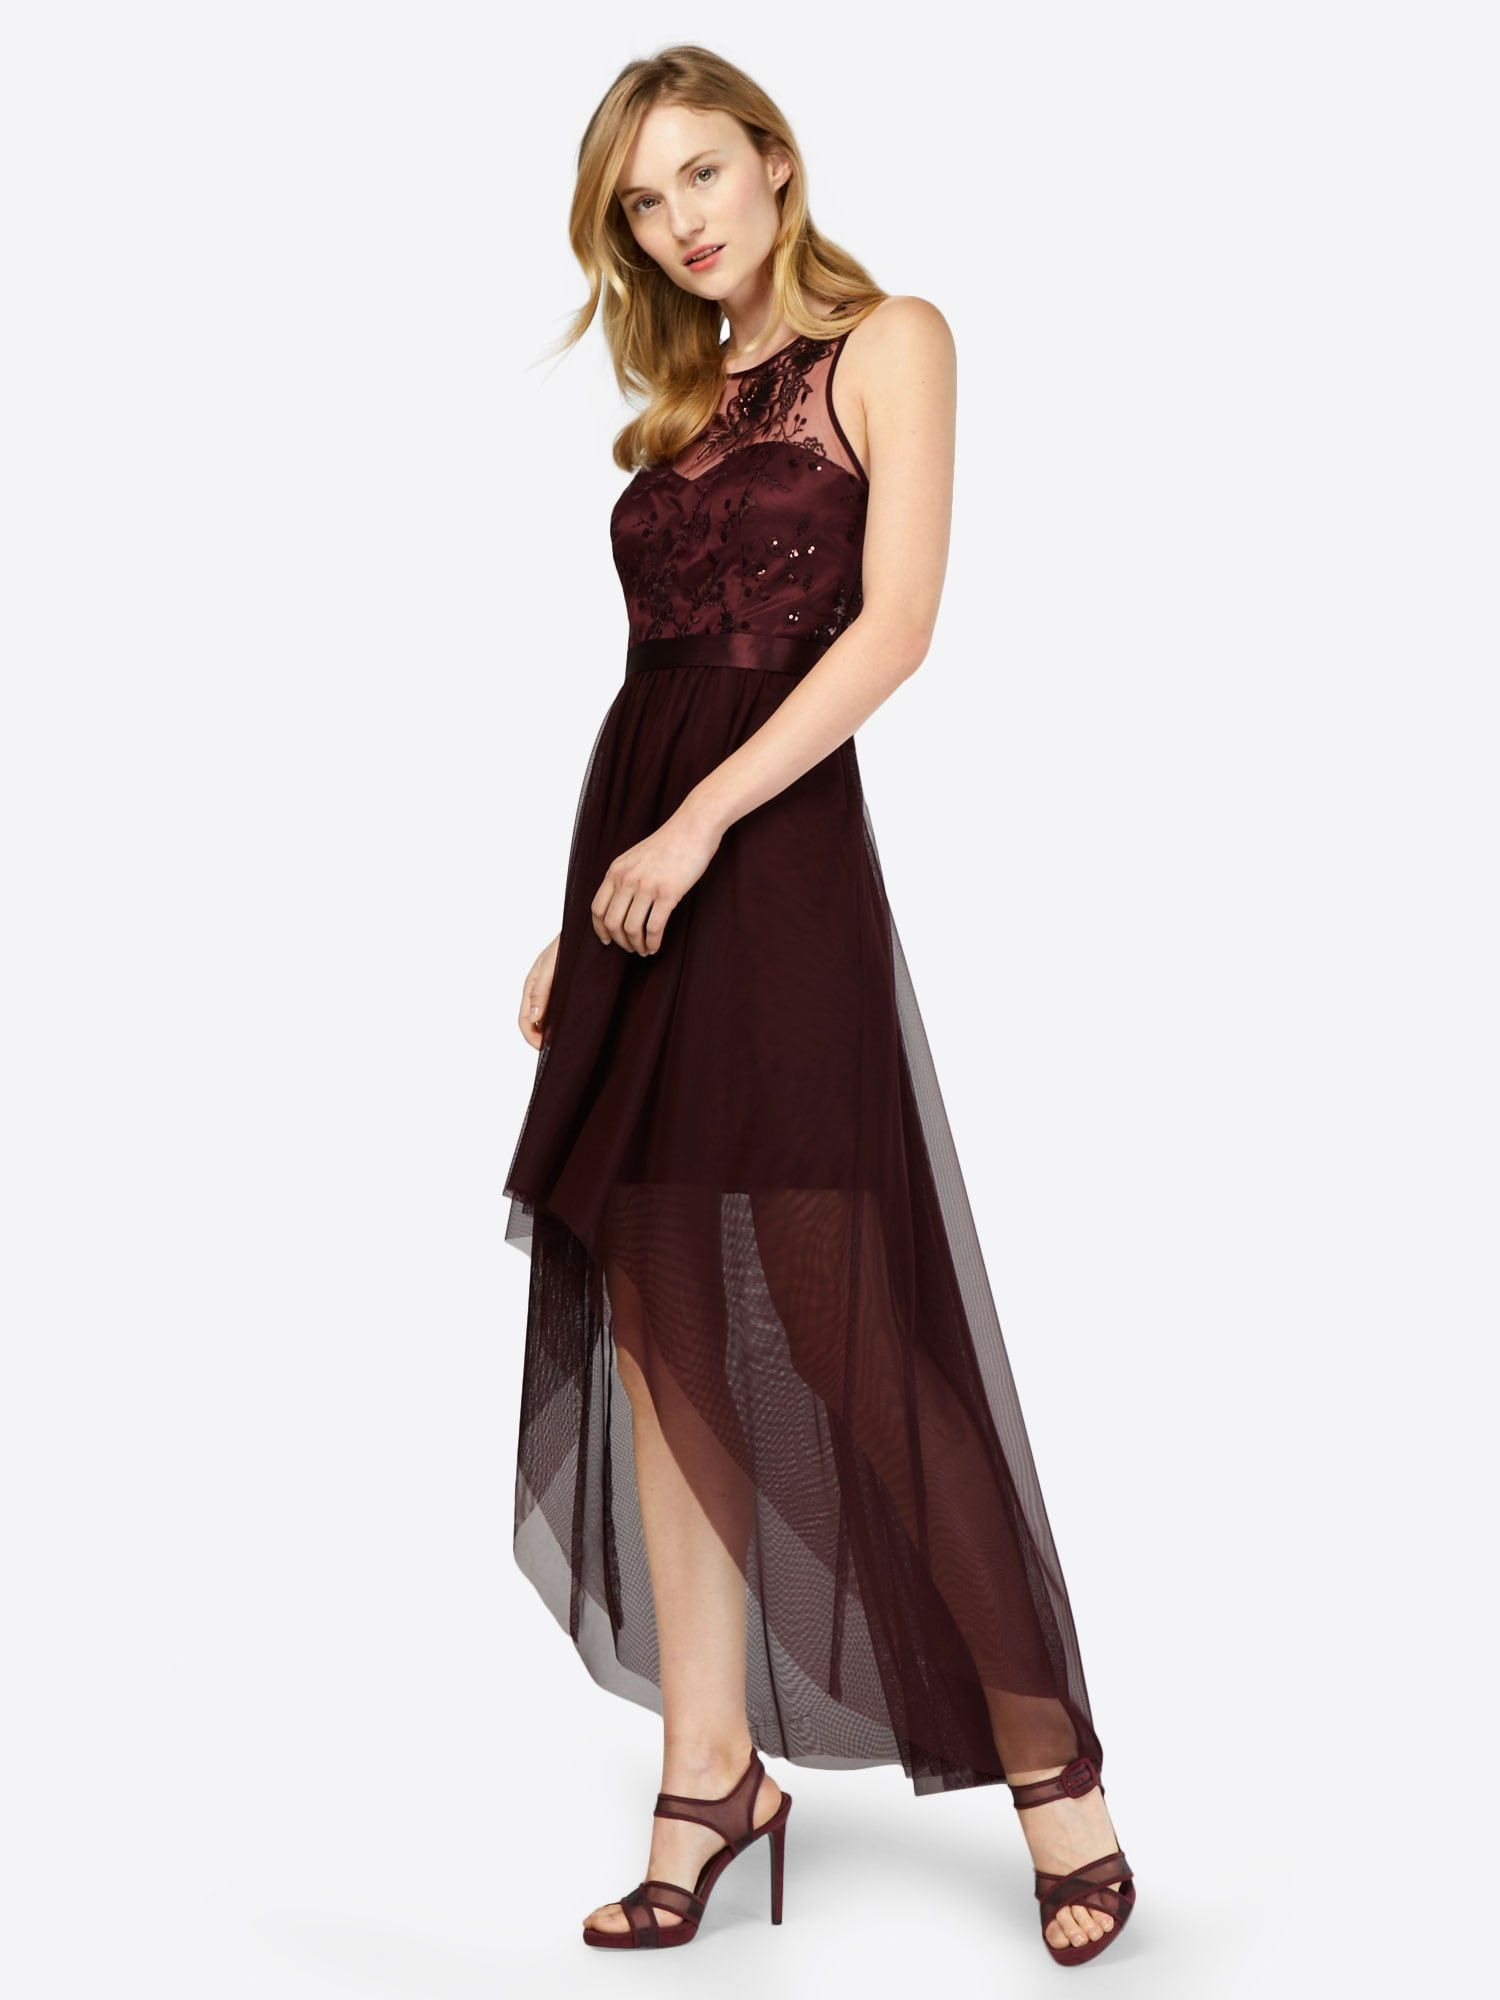 13 Genial Vm Vera Mont Abendkleid Bester Preis15 Ausgezeichnet Vm Vera Mont Abendkleid Ärmel